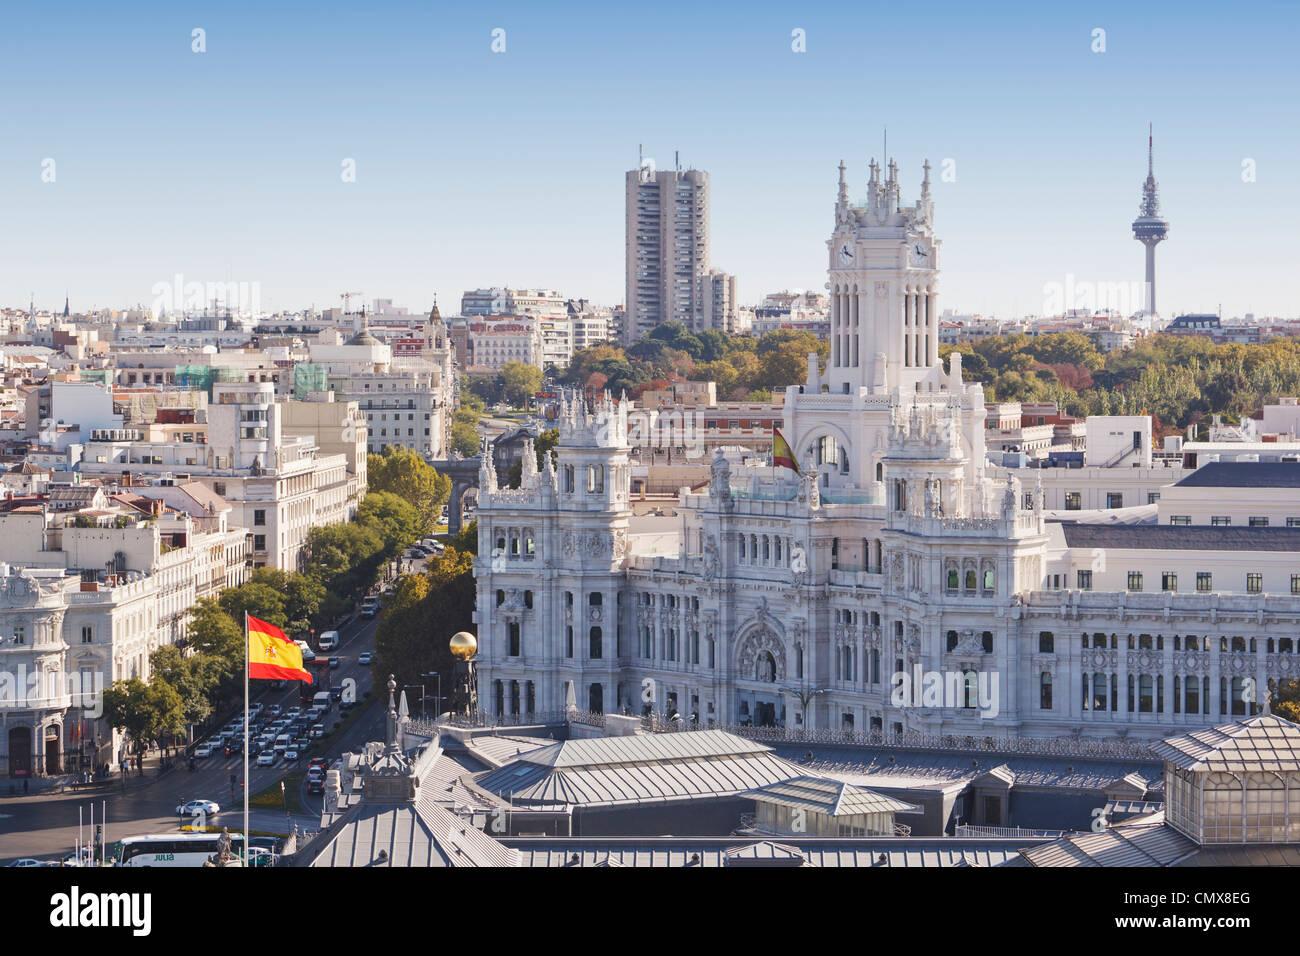 Madrid, Spain. Cibeles Palace in Plaza de Cibeles. - Stock Image